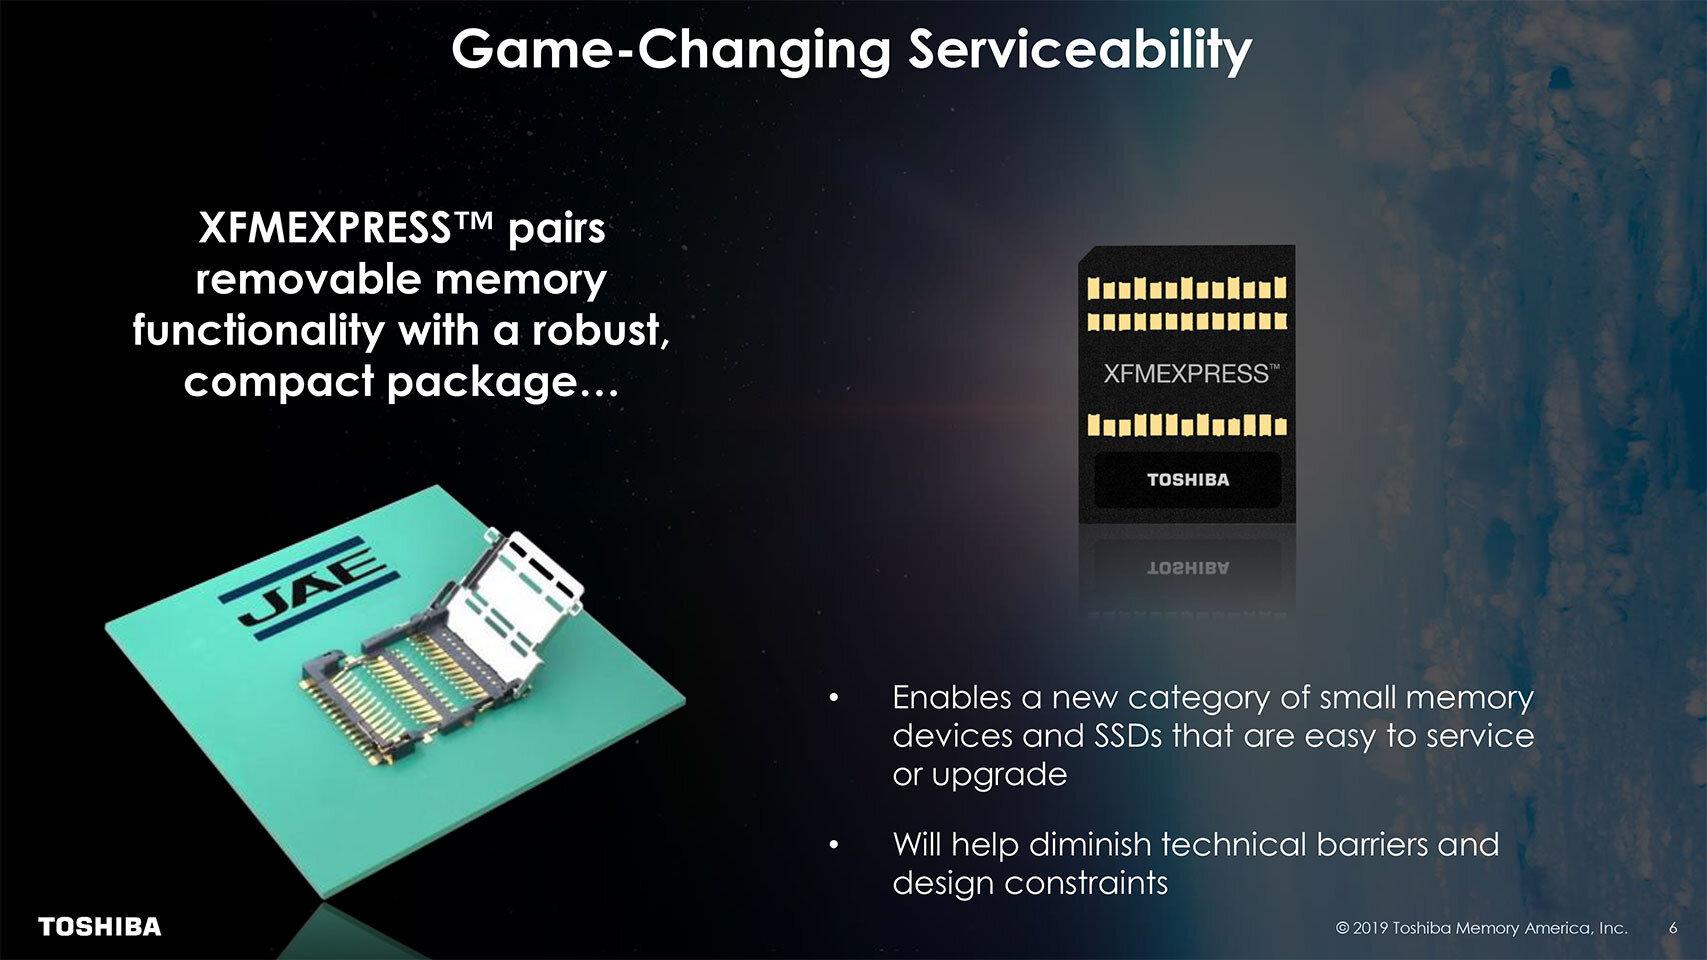 XFMExpress: Speichermodul und Sockel